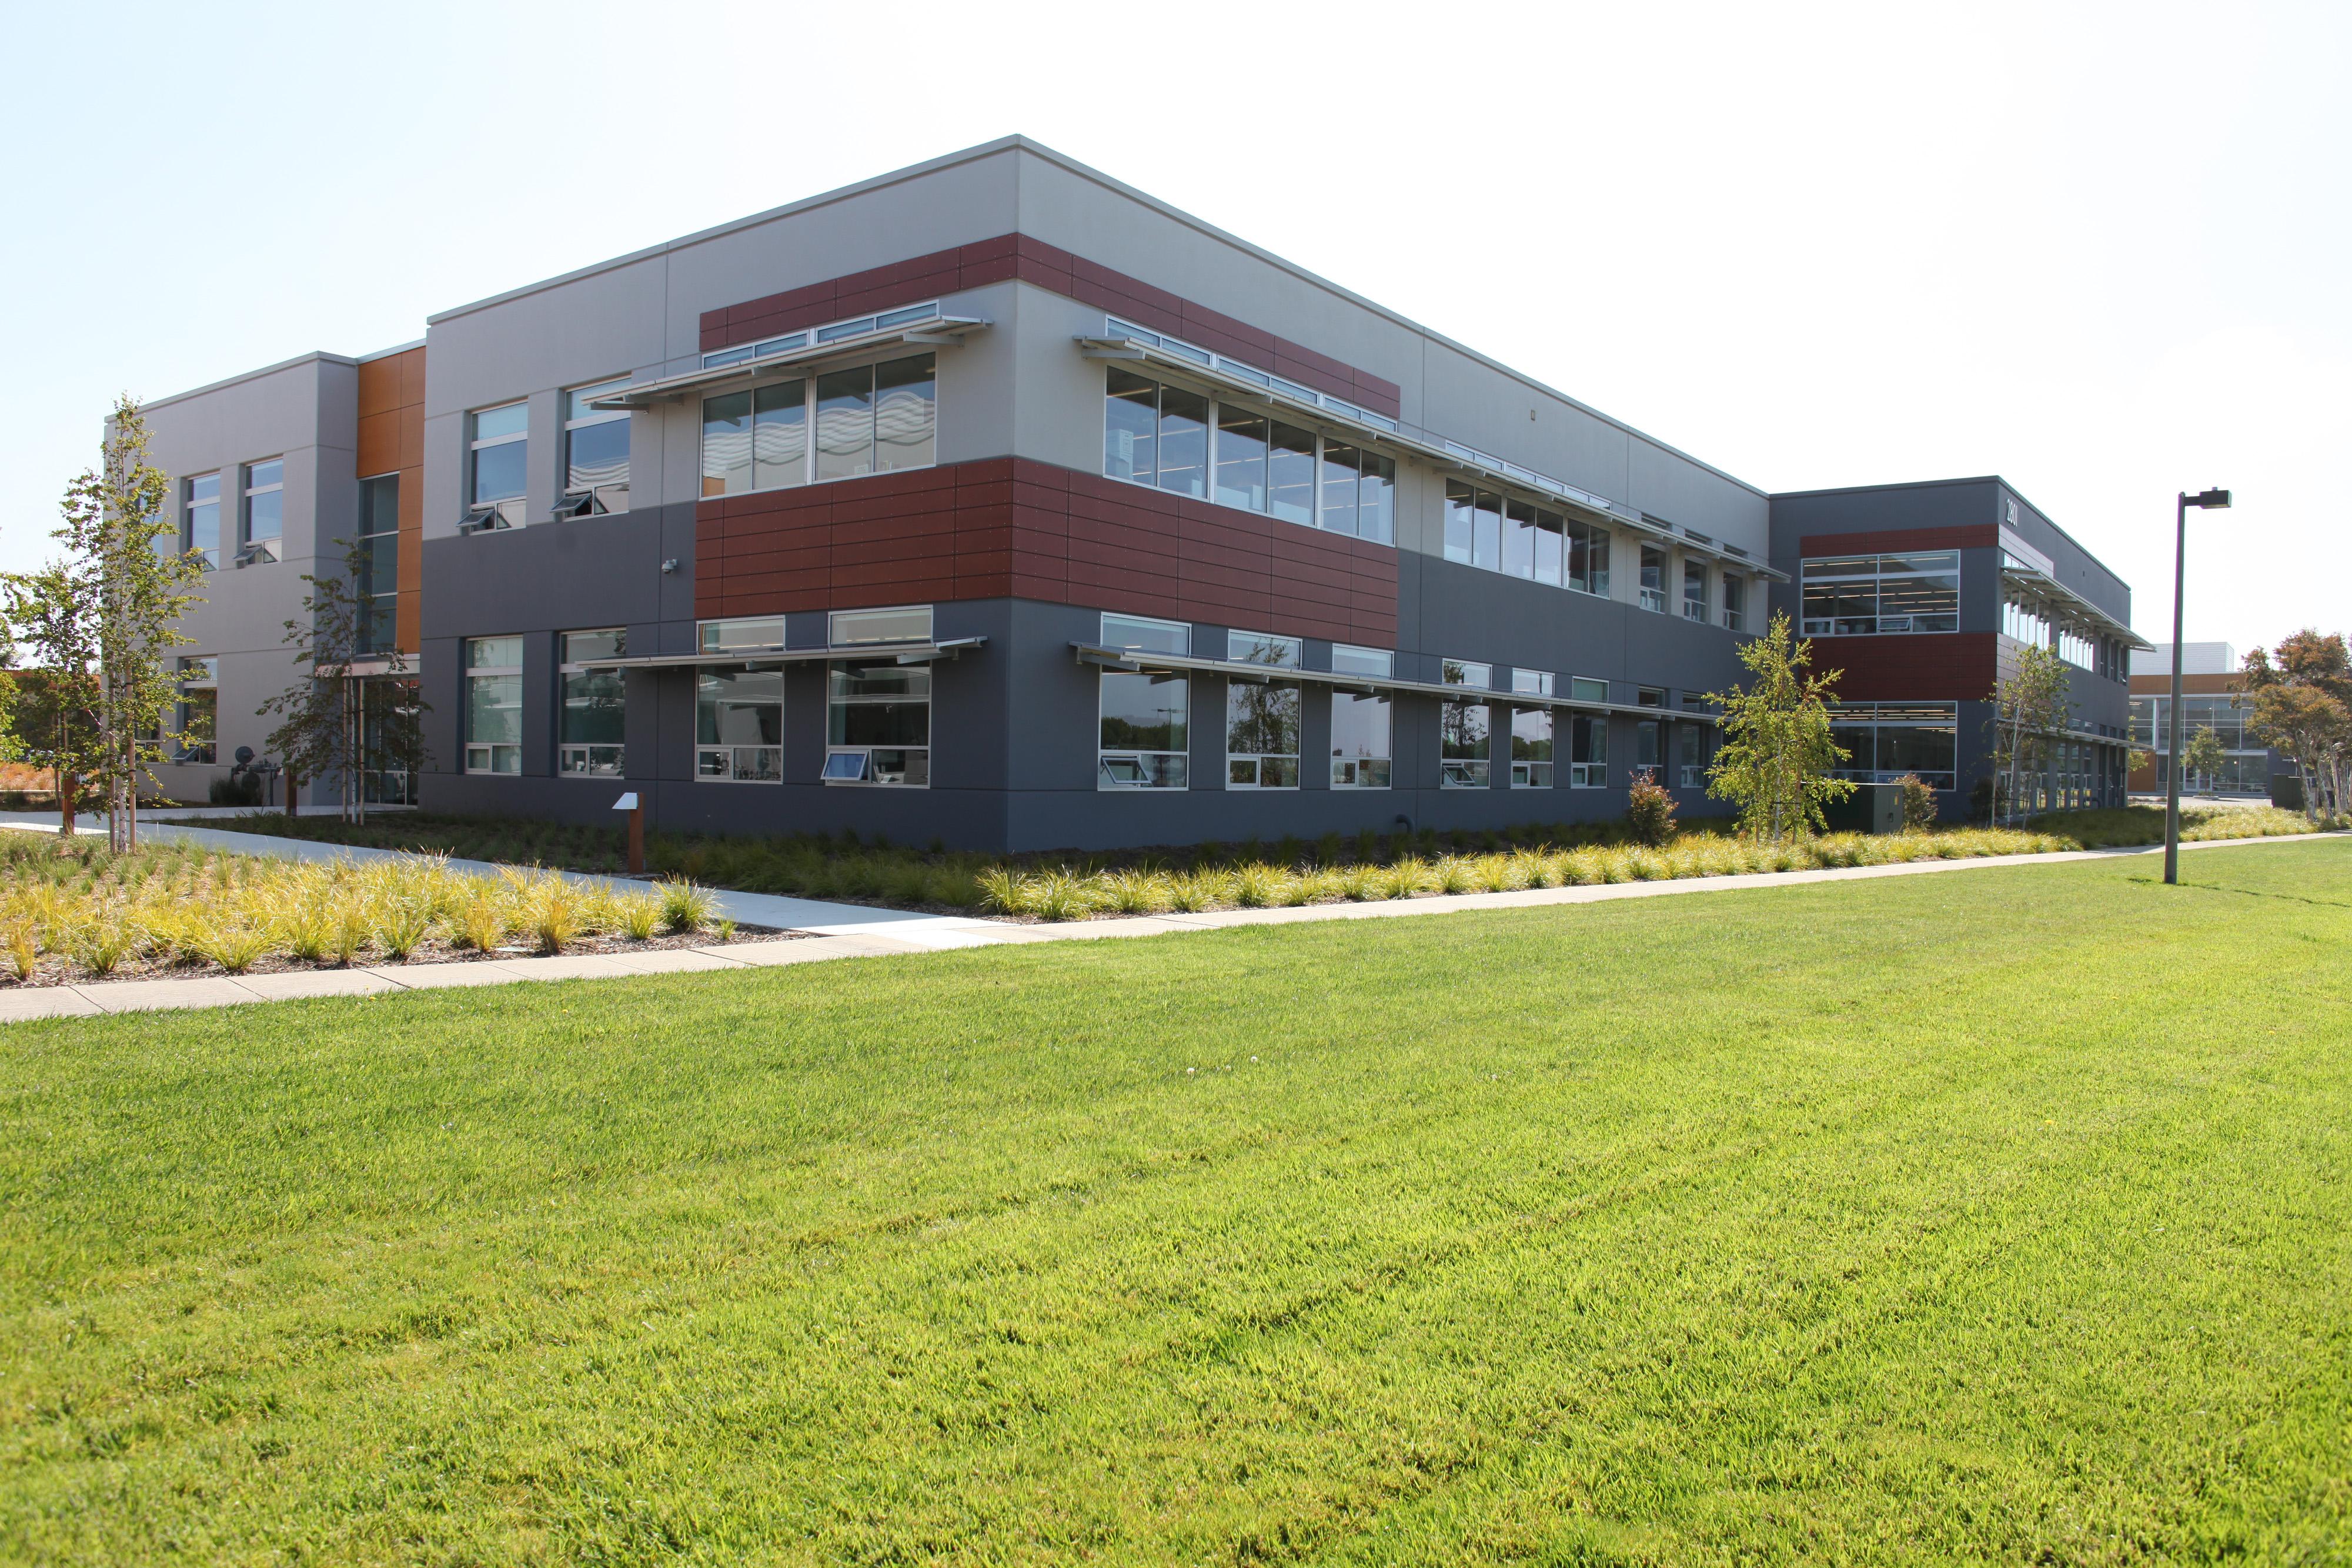 Sustainability Vf Corporation Vfc